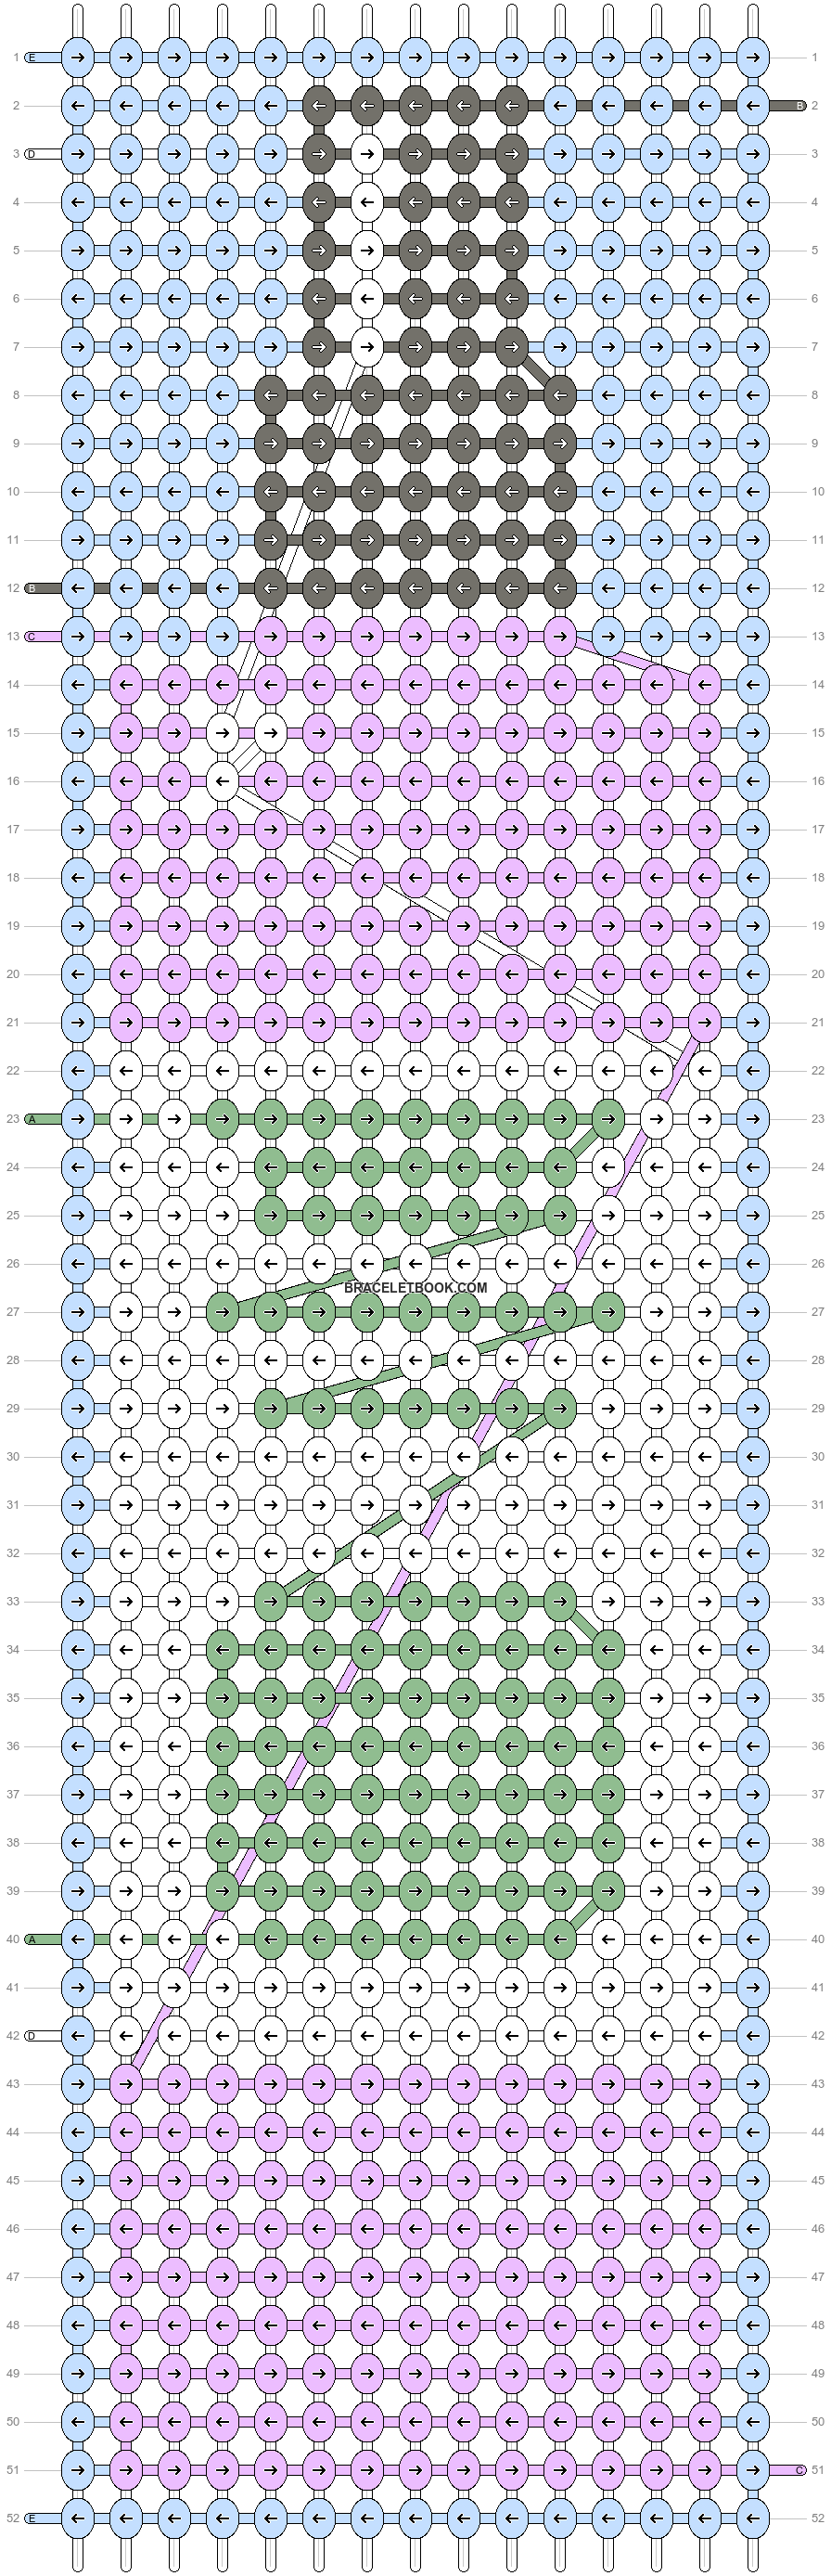 Alpha pattern #49028 variation #76834 pattern